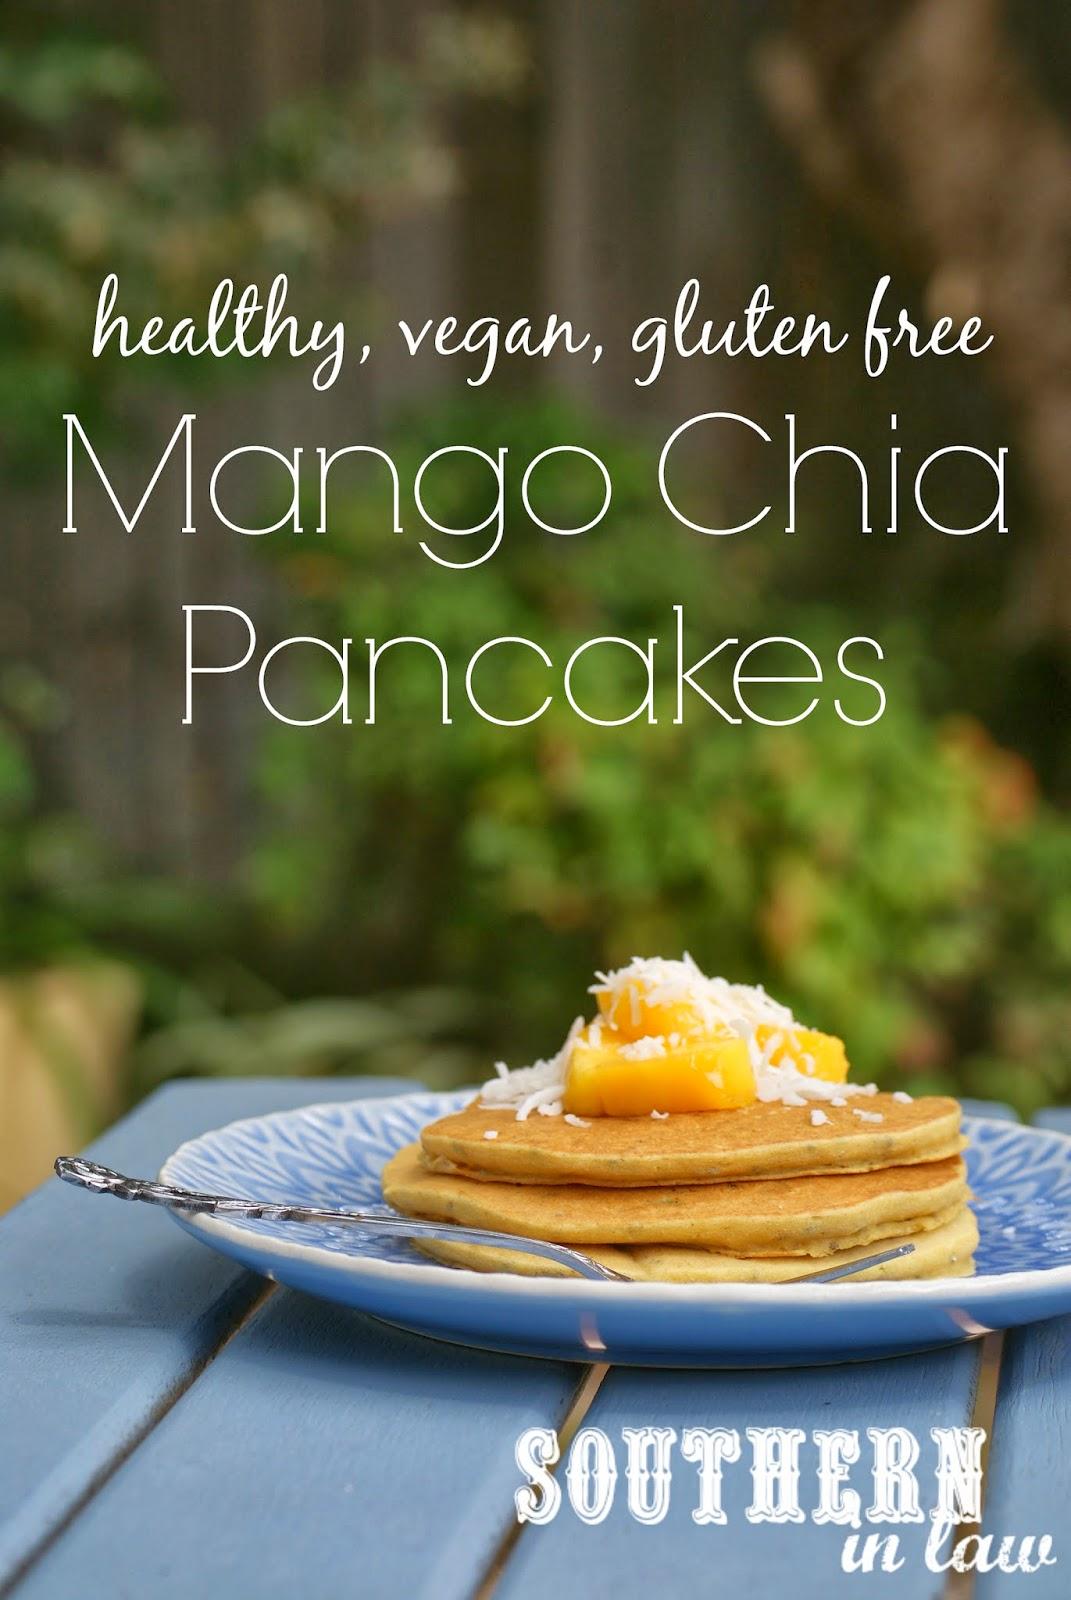 Vegan Mango Chia Pancakes Recipe - gluten free, low fat, sugar free, clean eating friendly, healthy